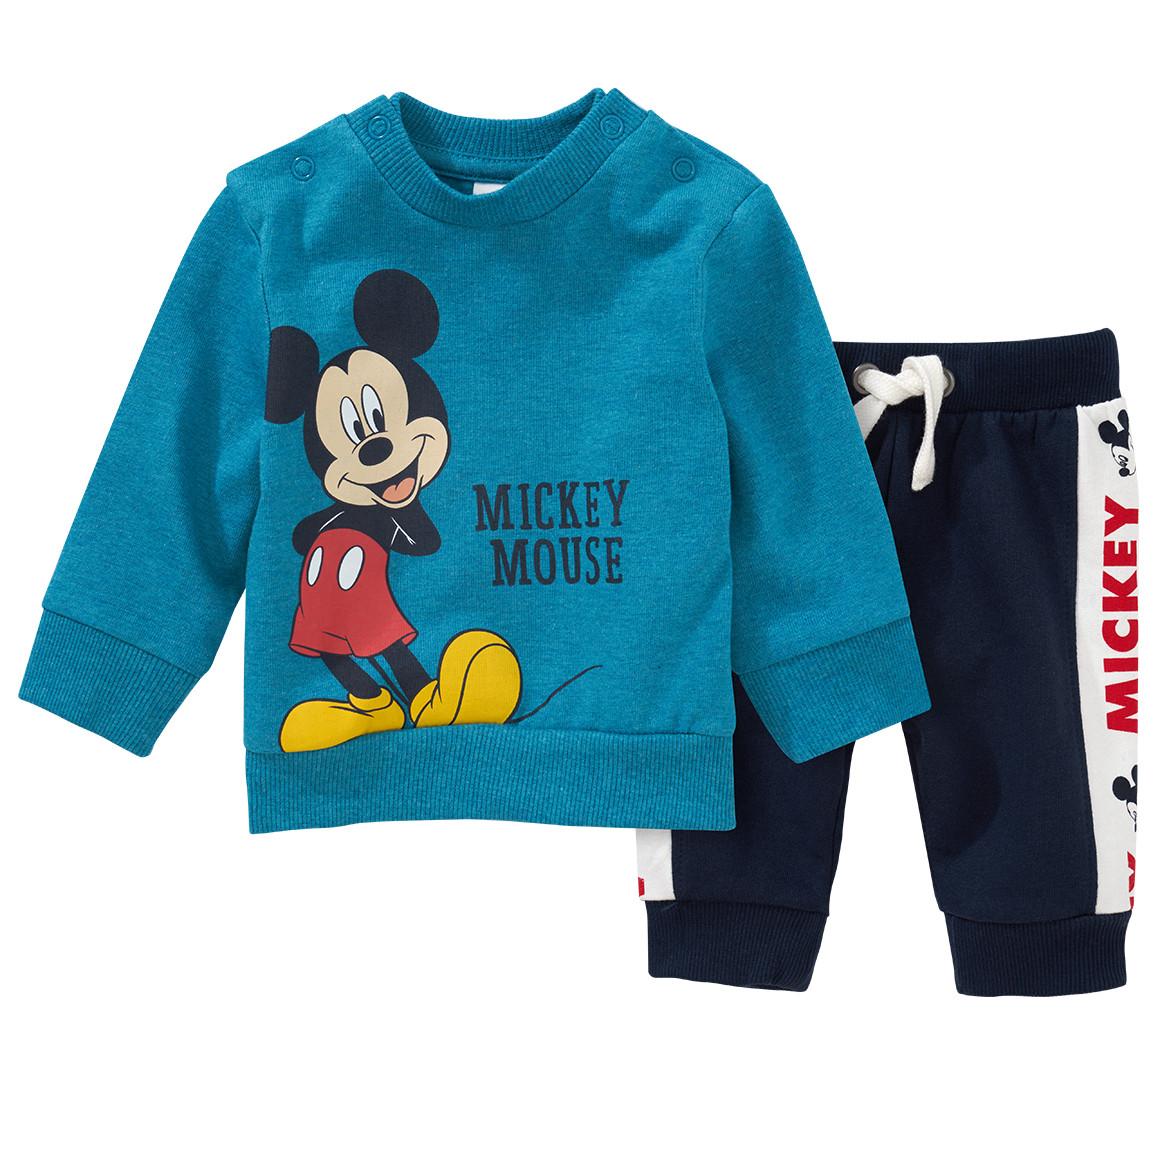 Babysets - Micky Maus Newborn Sweatshirt und Jogpants - Onlineshop Ernstings family